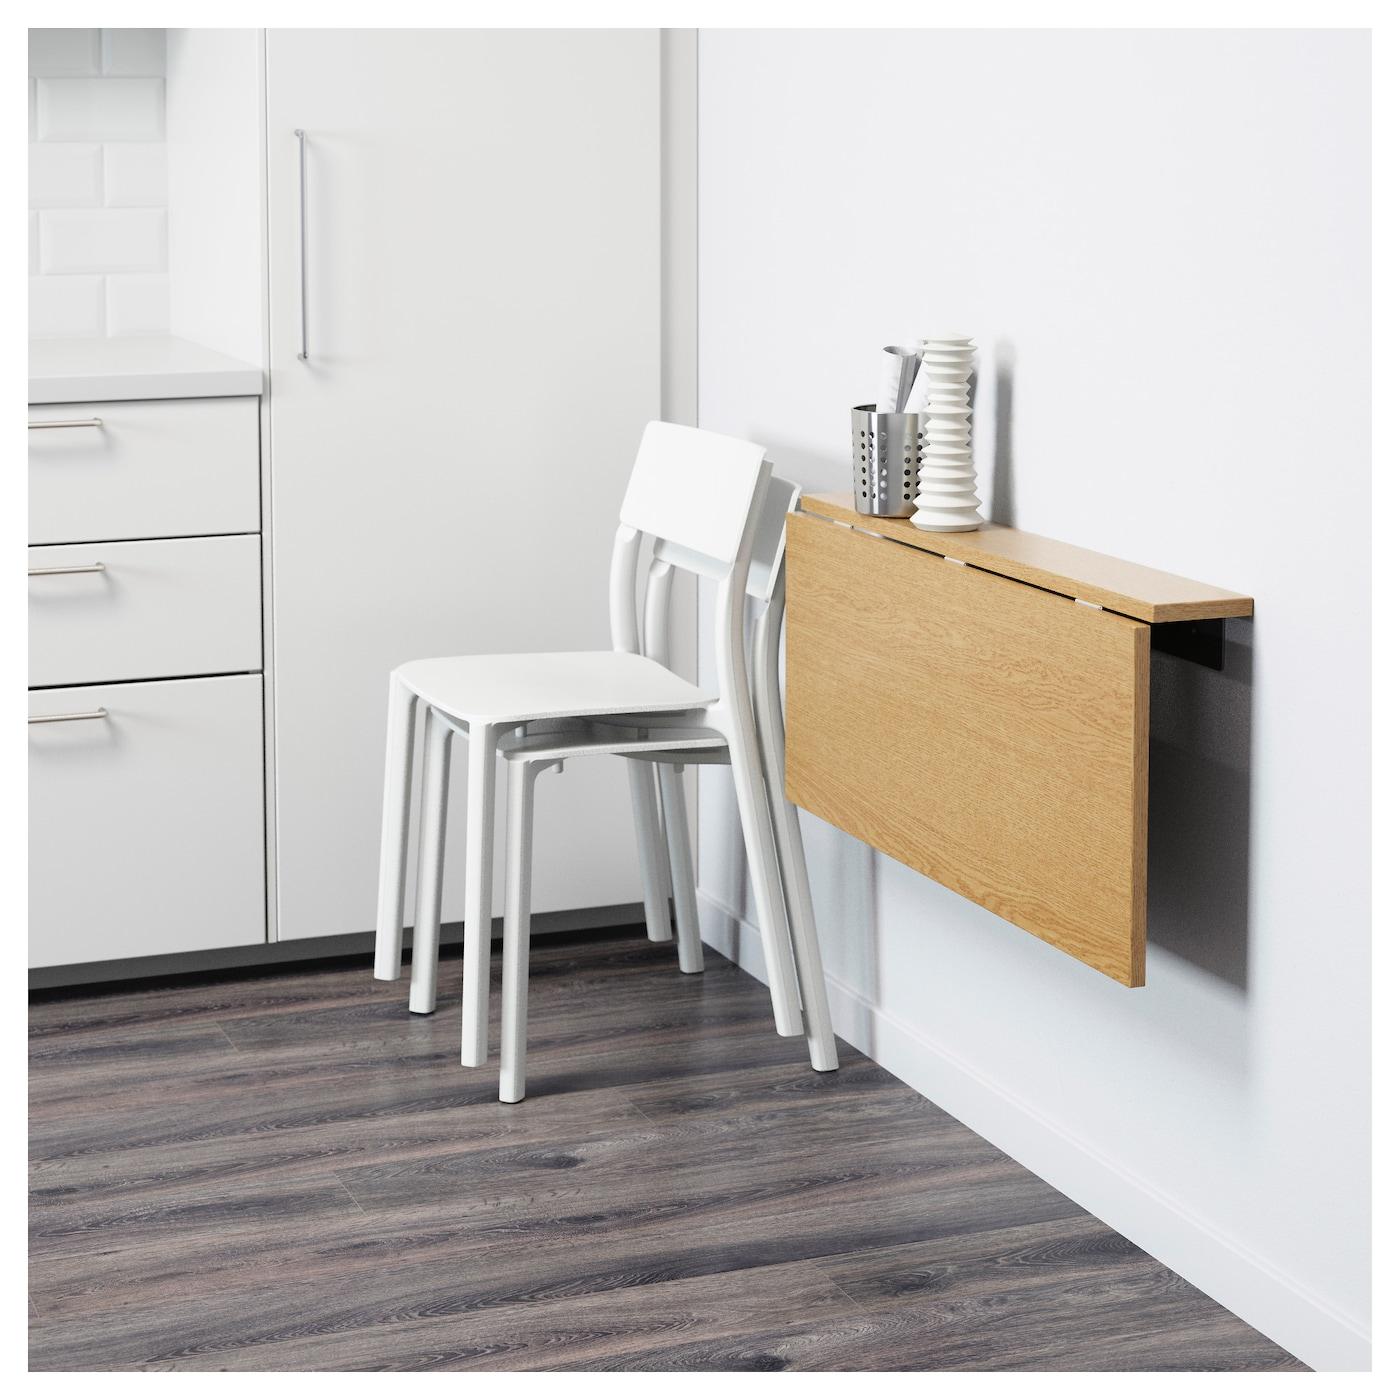 Bjursta Wallmounted Dropleaf Table Oak Veneer 90x50 Cm. Sliding Wire Basket Drawers. High Desk Chairs. Military Desk Jobs. Old Fashioned School Desk. Google Drive Desk. Cheap Desk Top. Ikea Micke Desk Instructions. L Shaped Table Desk